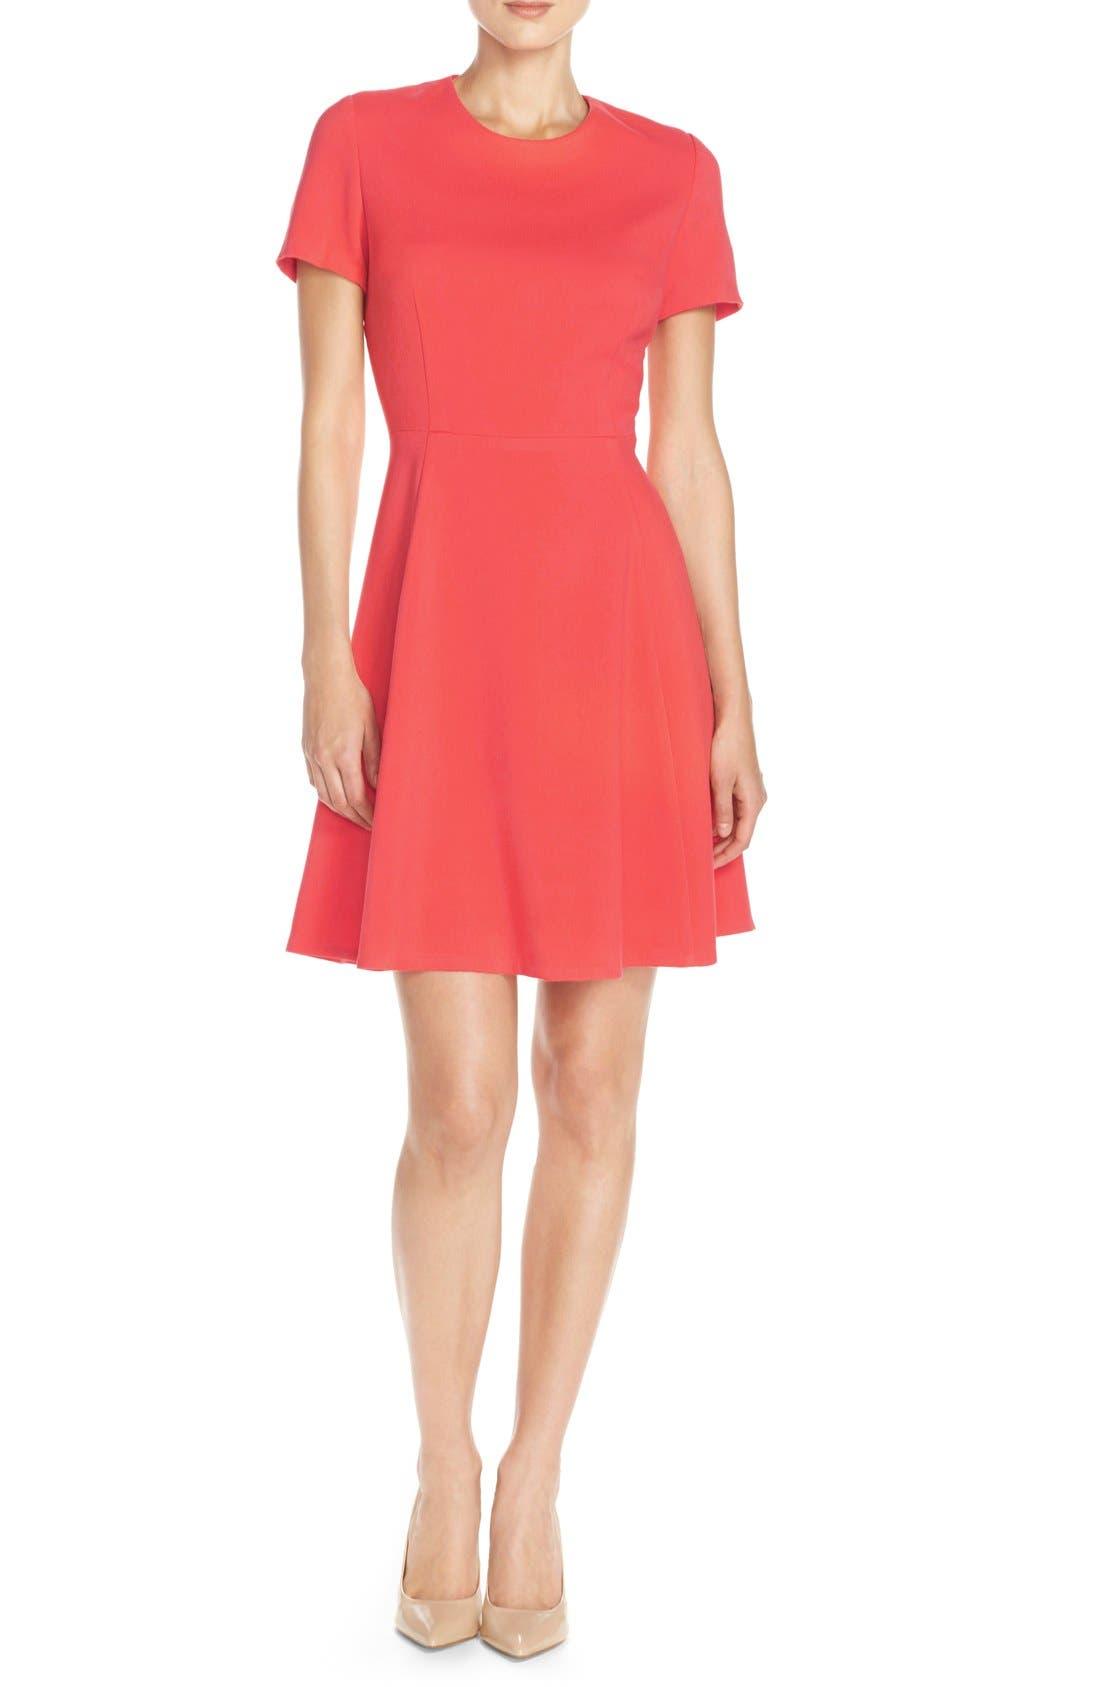 Main Image - Eliza J Crepe Fit & Flare Dress (Regular & Petite)